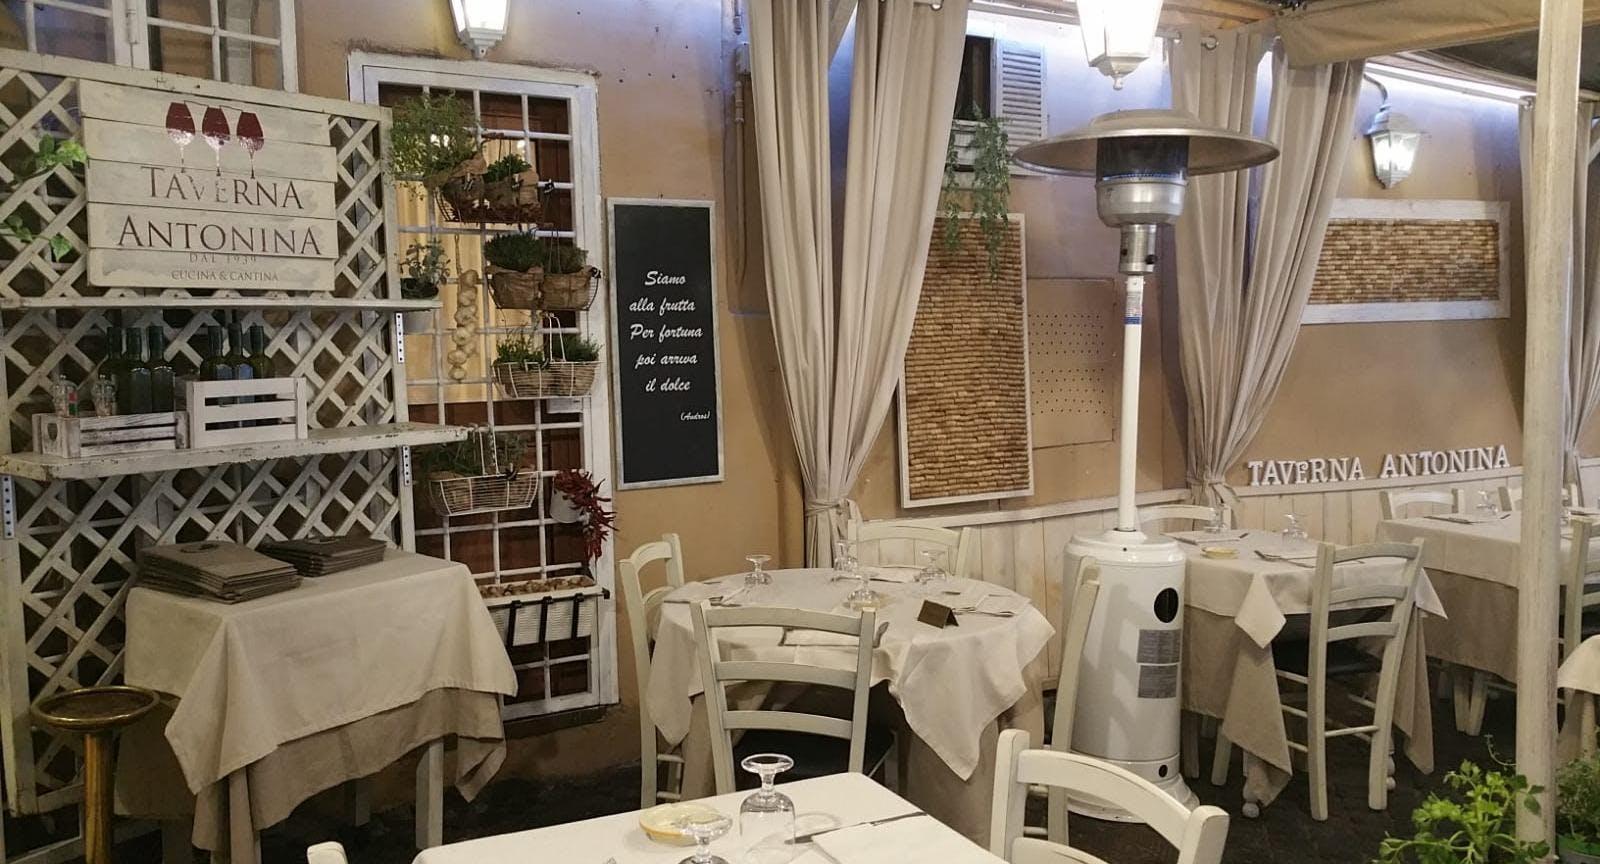 Taverna Antonina dal 1939 Rome image 2